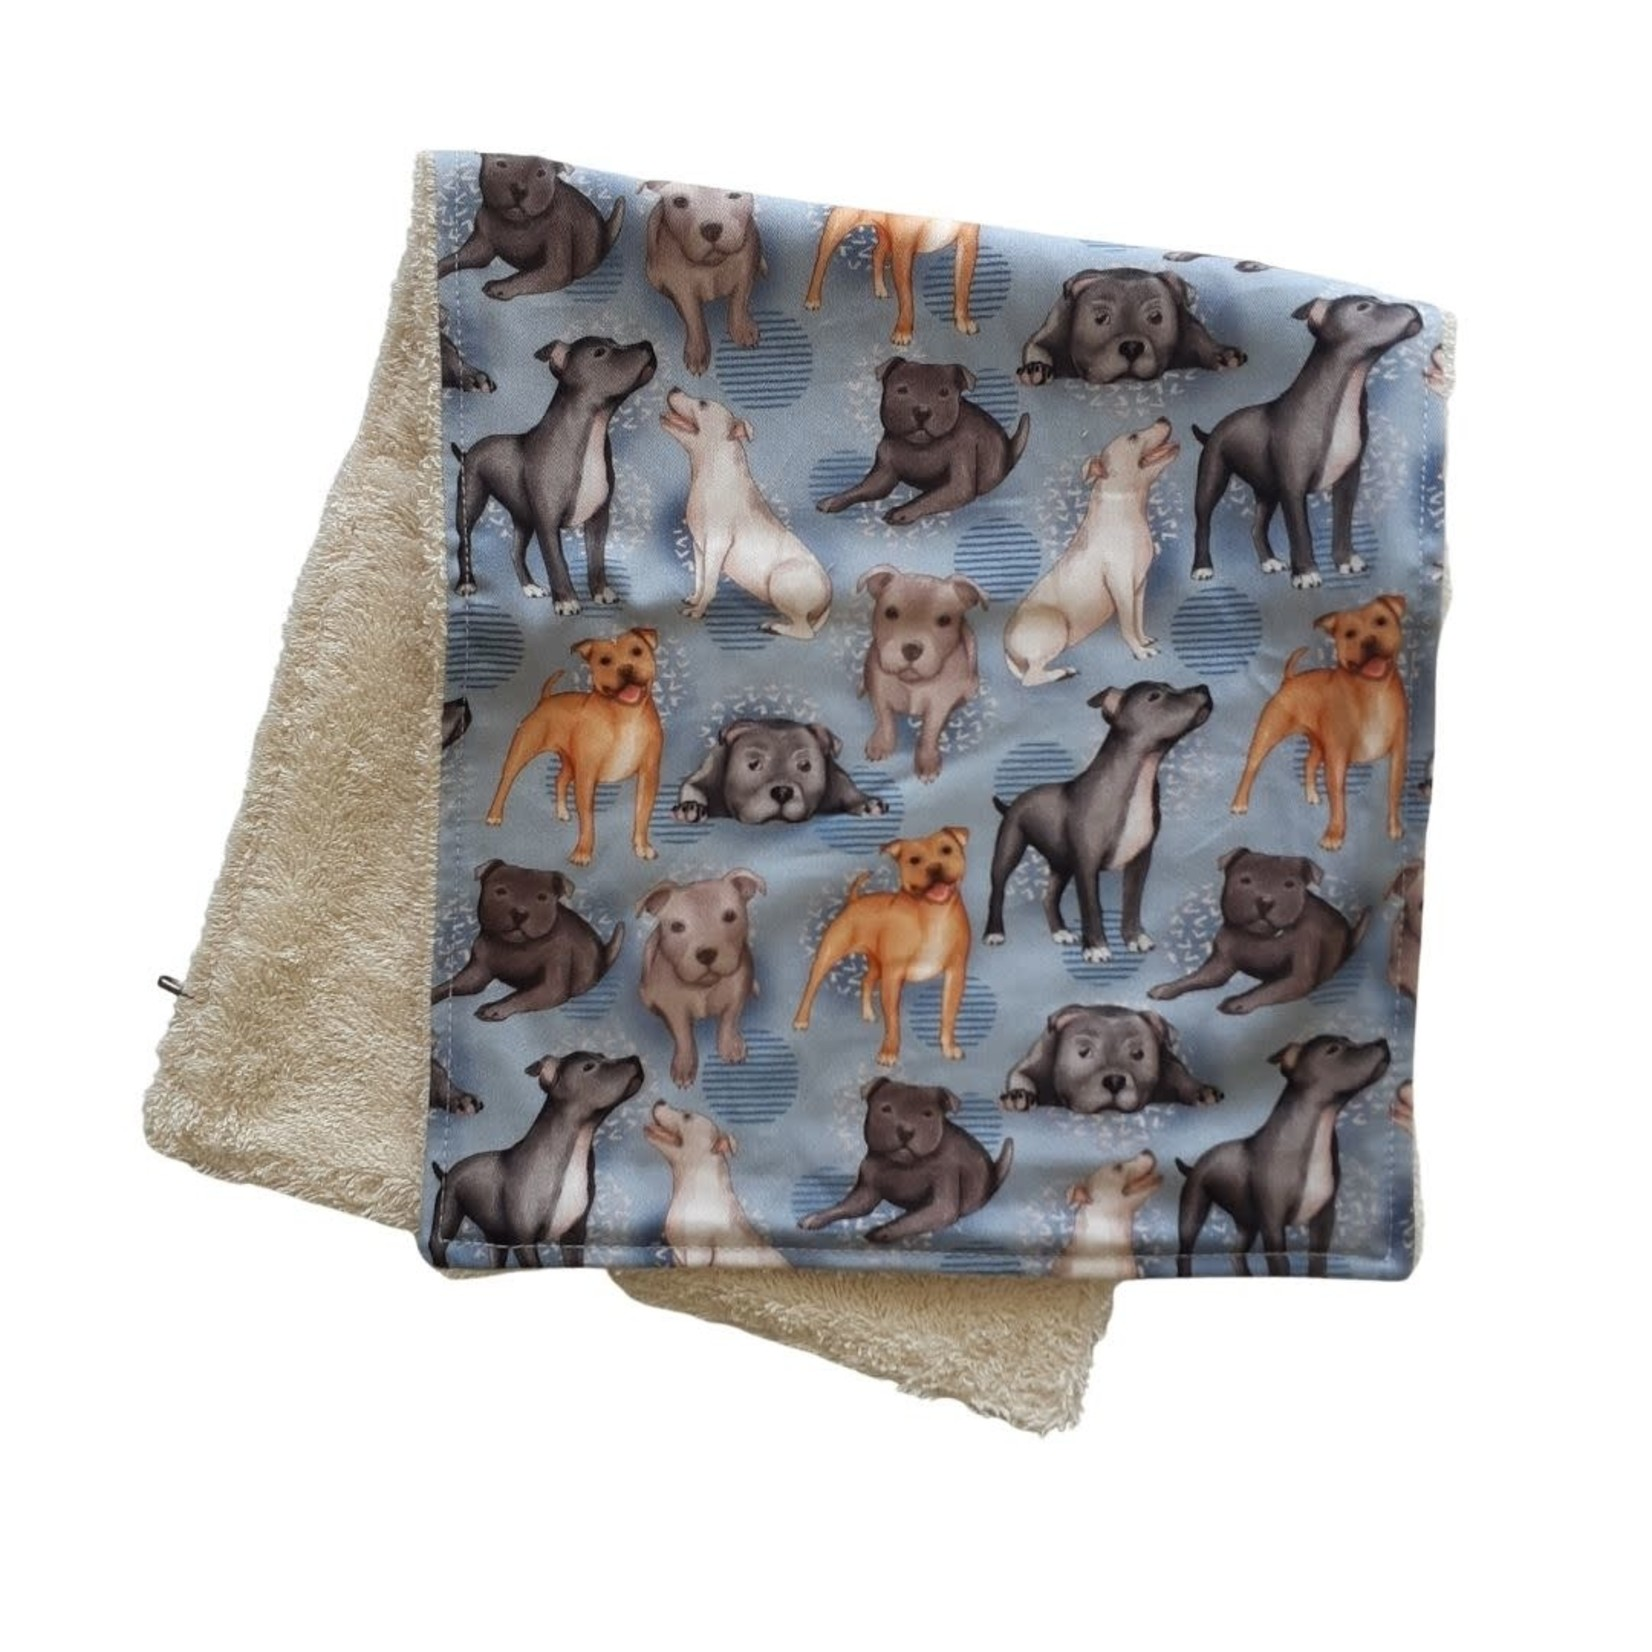 Wacky Wardrobe Mini Madz Organic Burp Cloth - Staffy